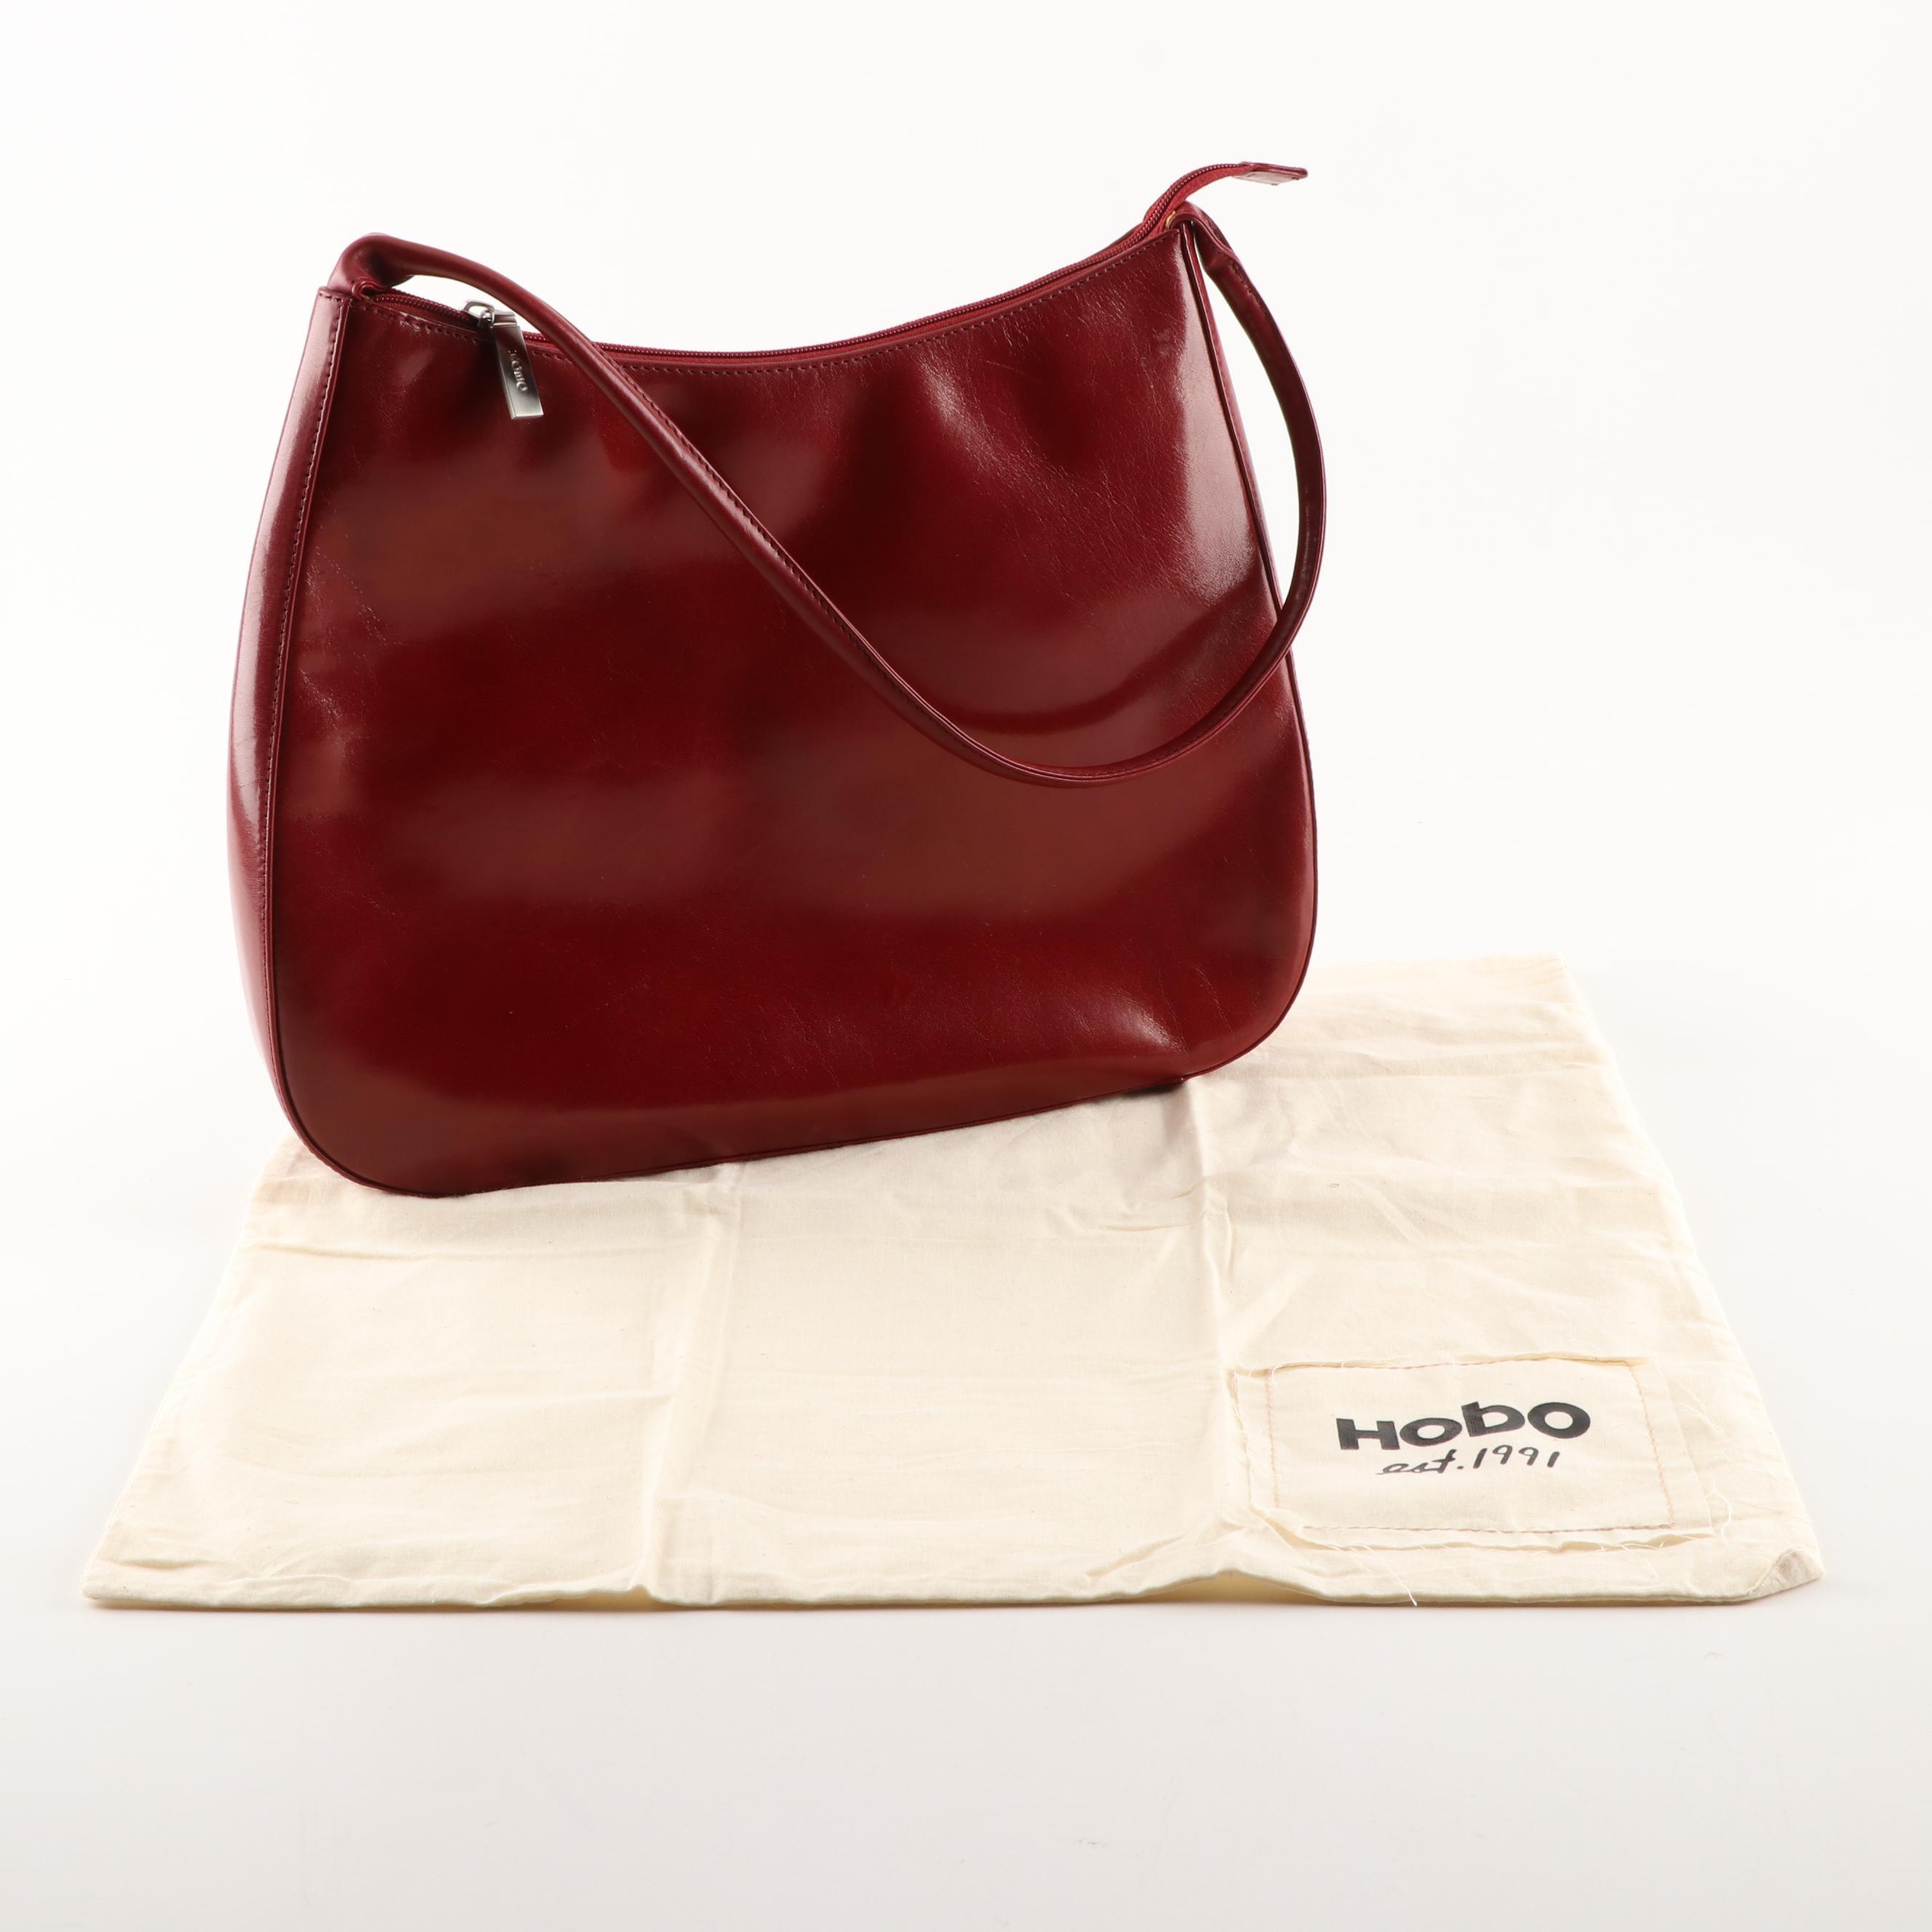 Hobo International Red Leather Handbag